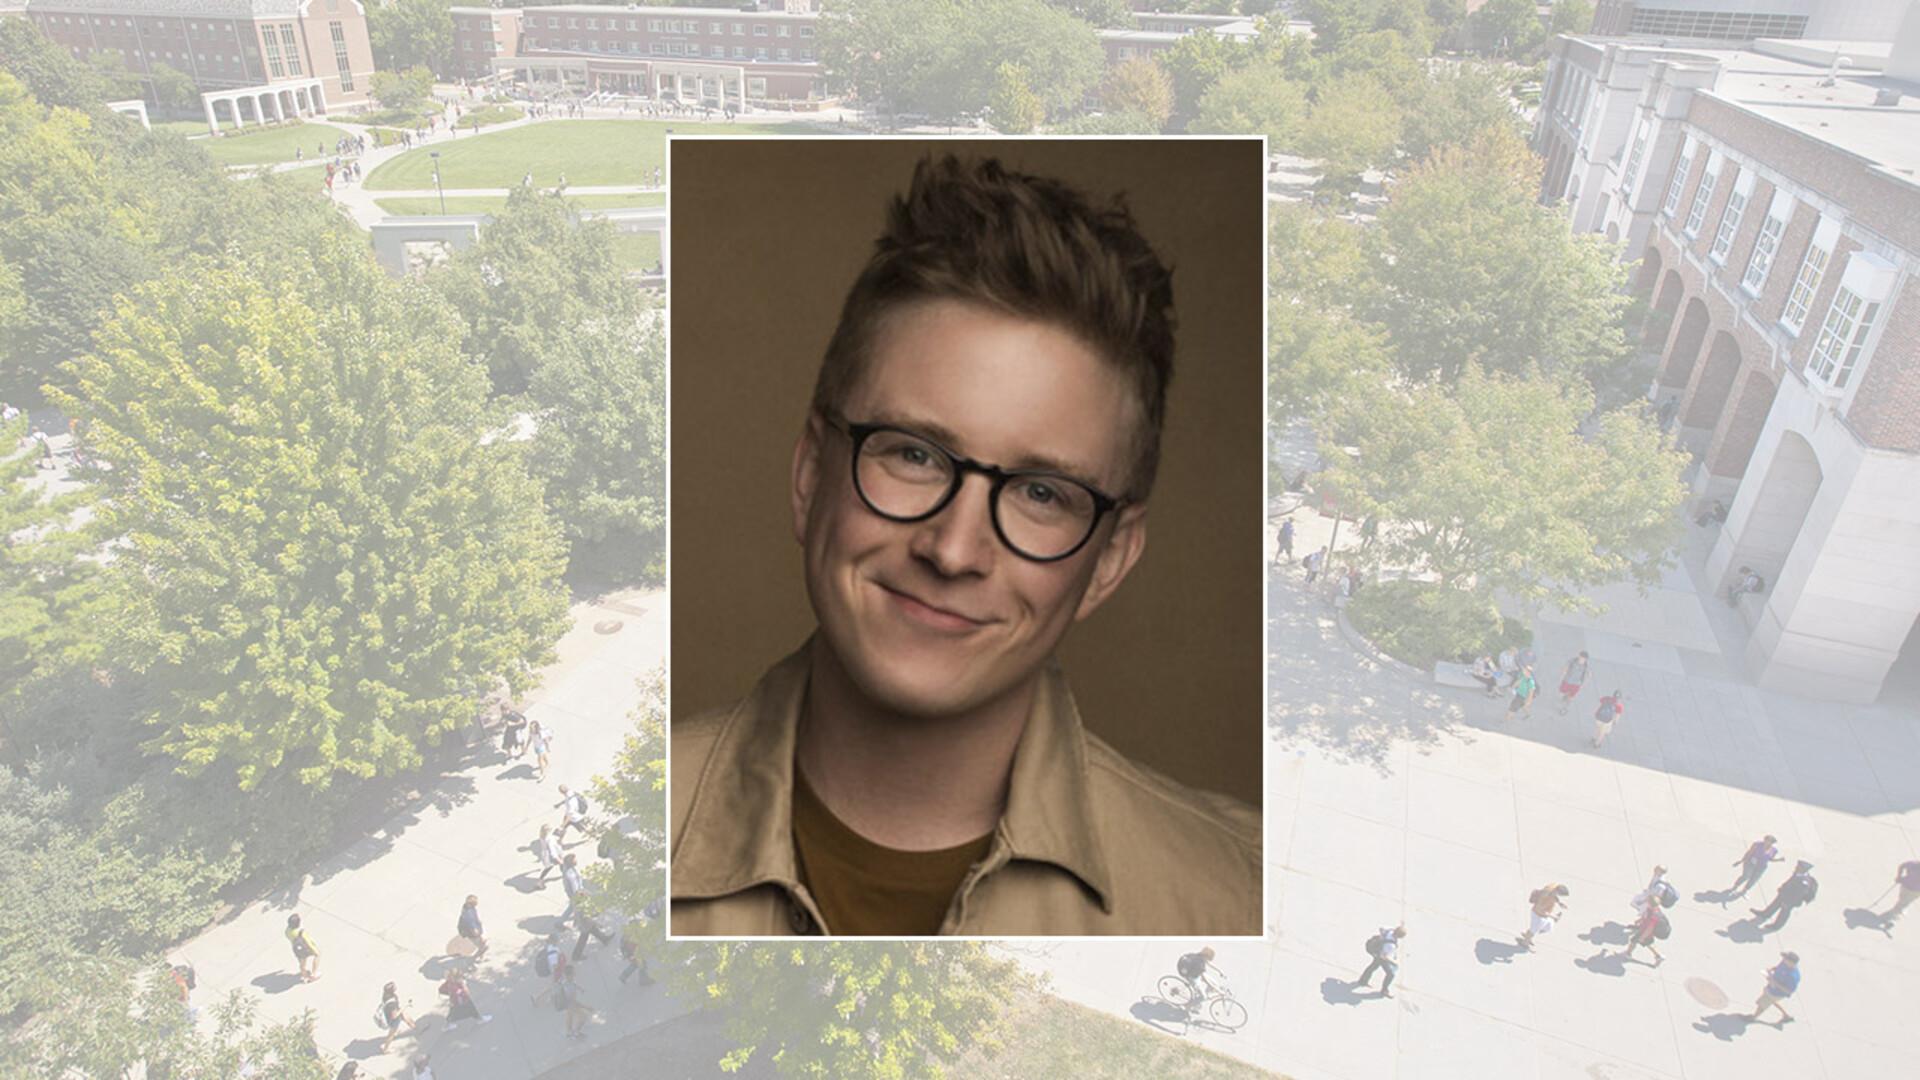 Social-media influencer Tyler Oakley to speak March 29